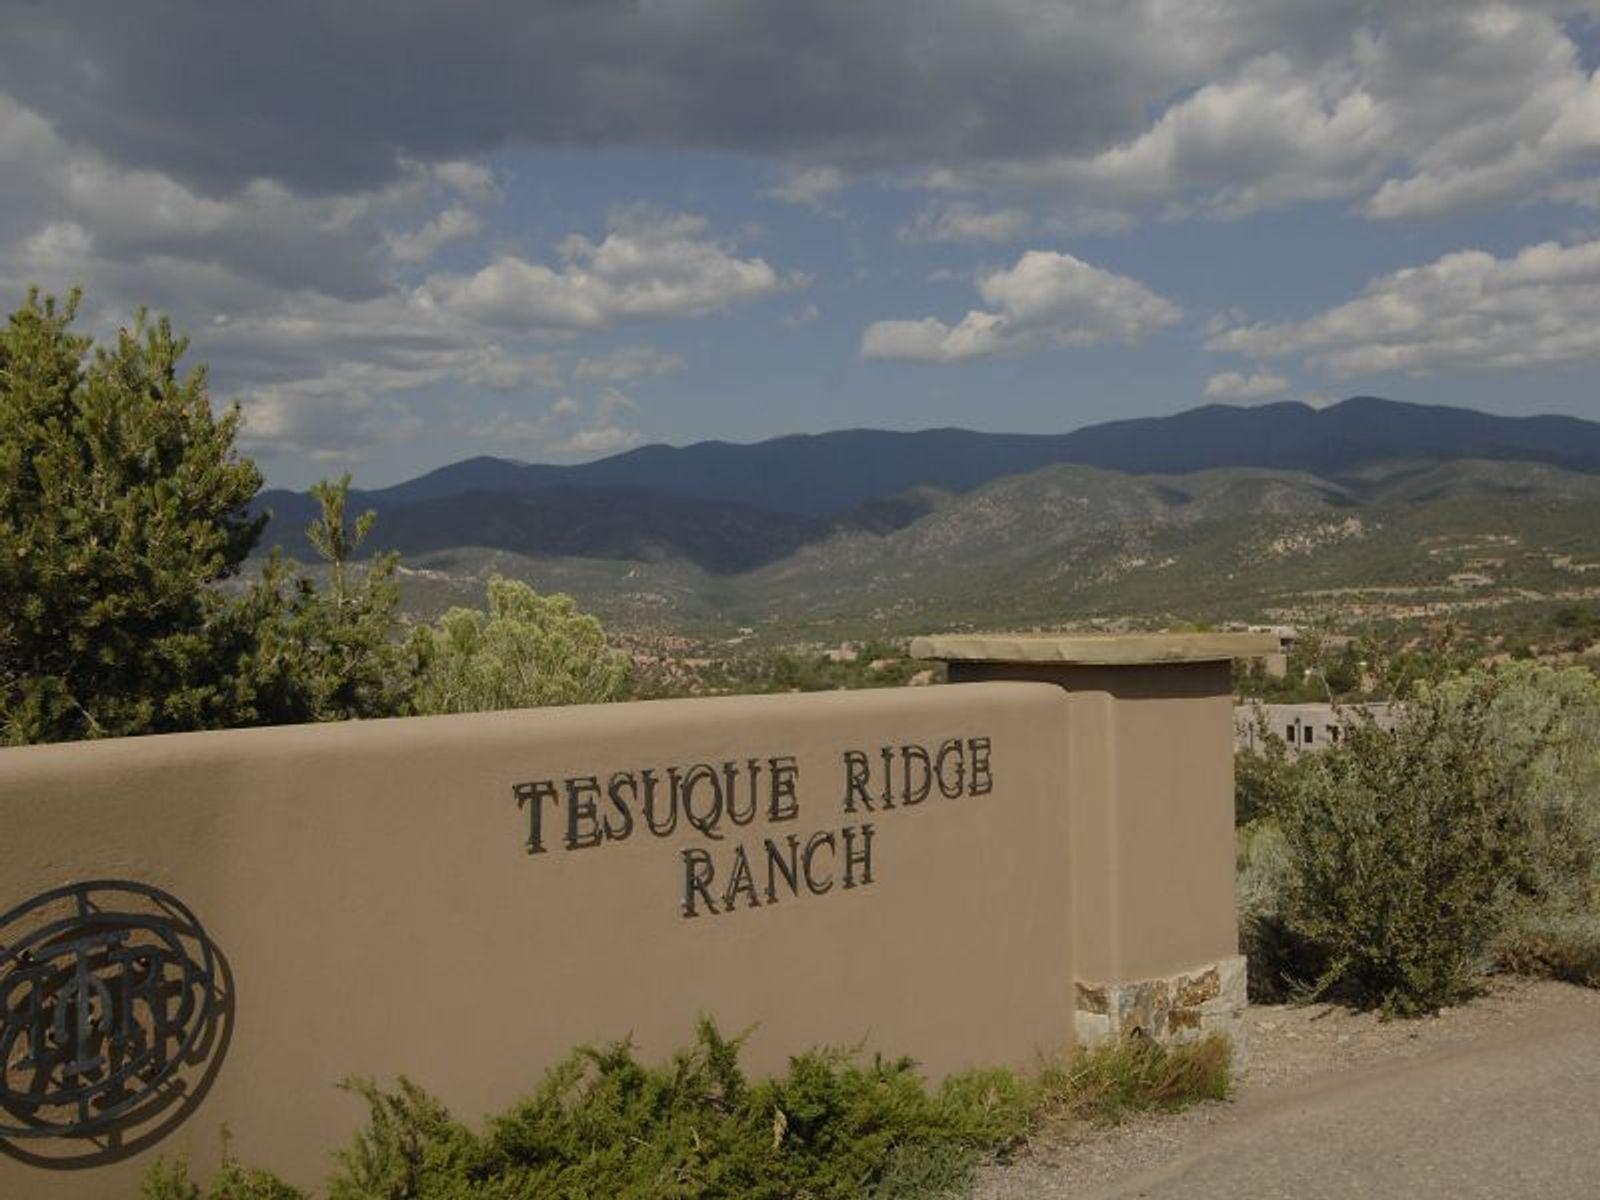 Lot 4, Tesuque Ridge Ranch